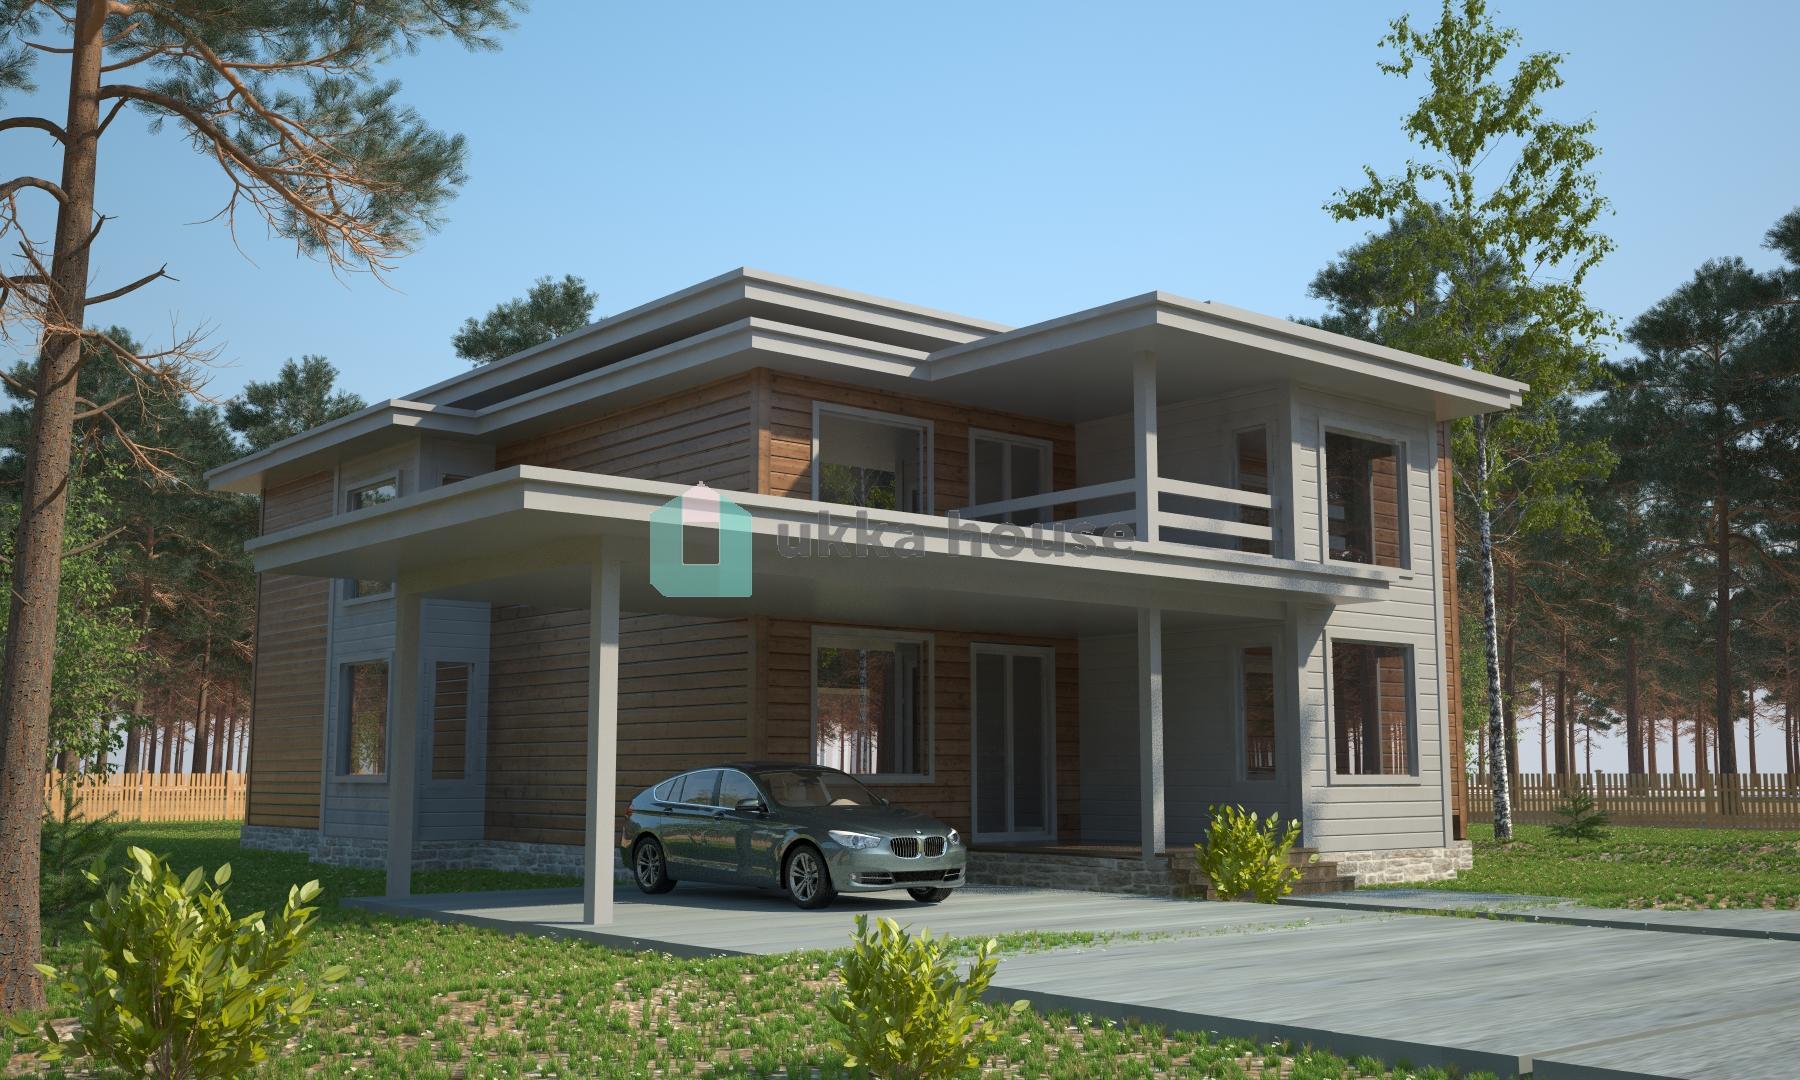 Проект «проект загородного дома в стиле модерн»